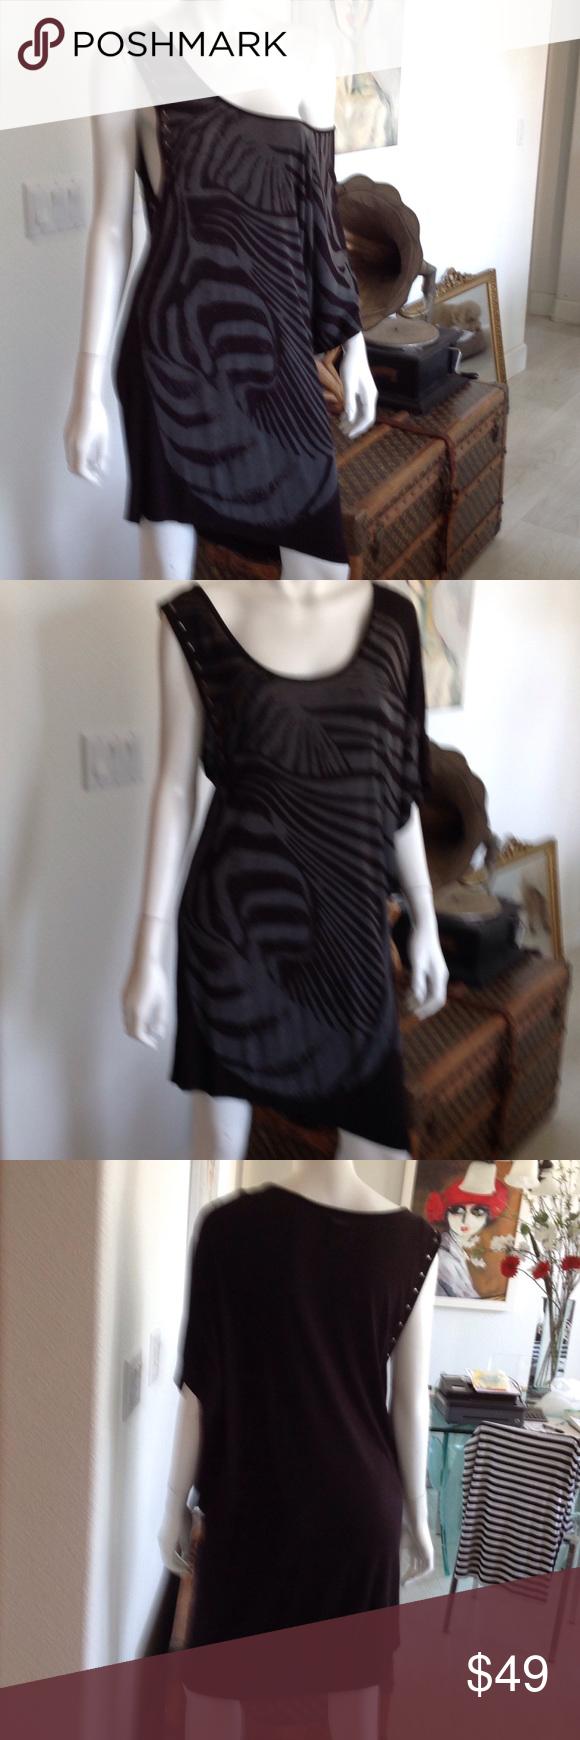 Replay dresstunic replay black cotton short dress tunic size small